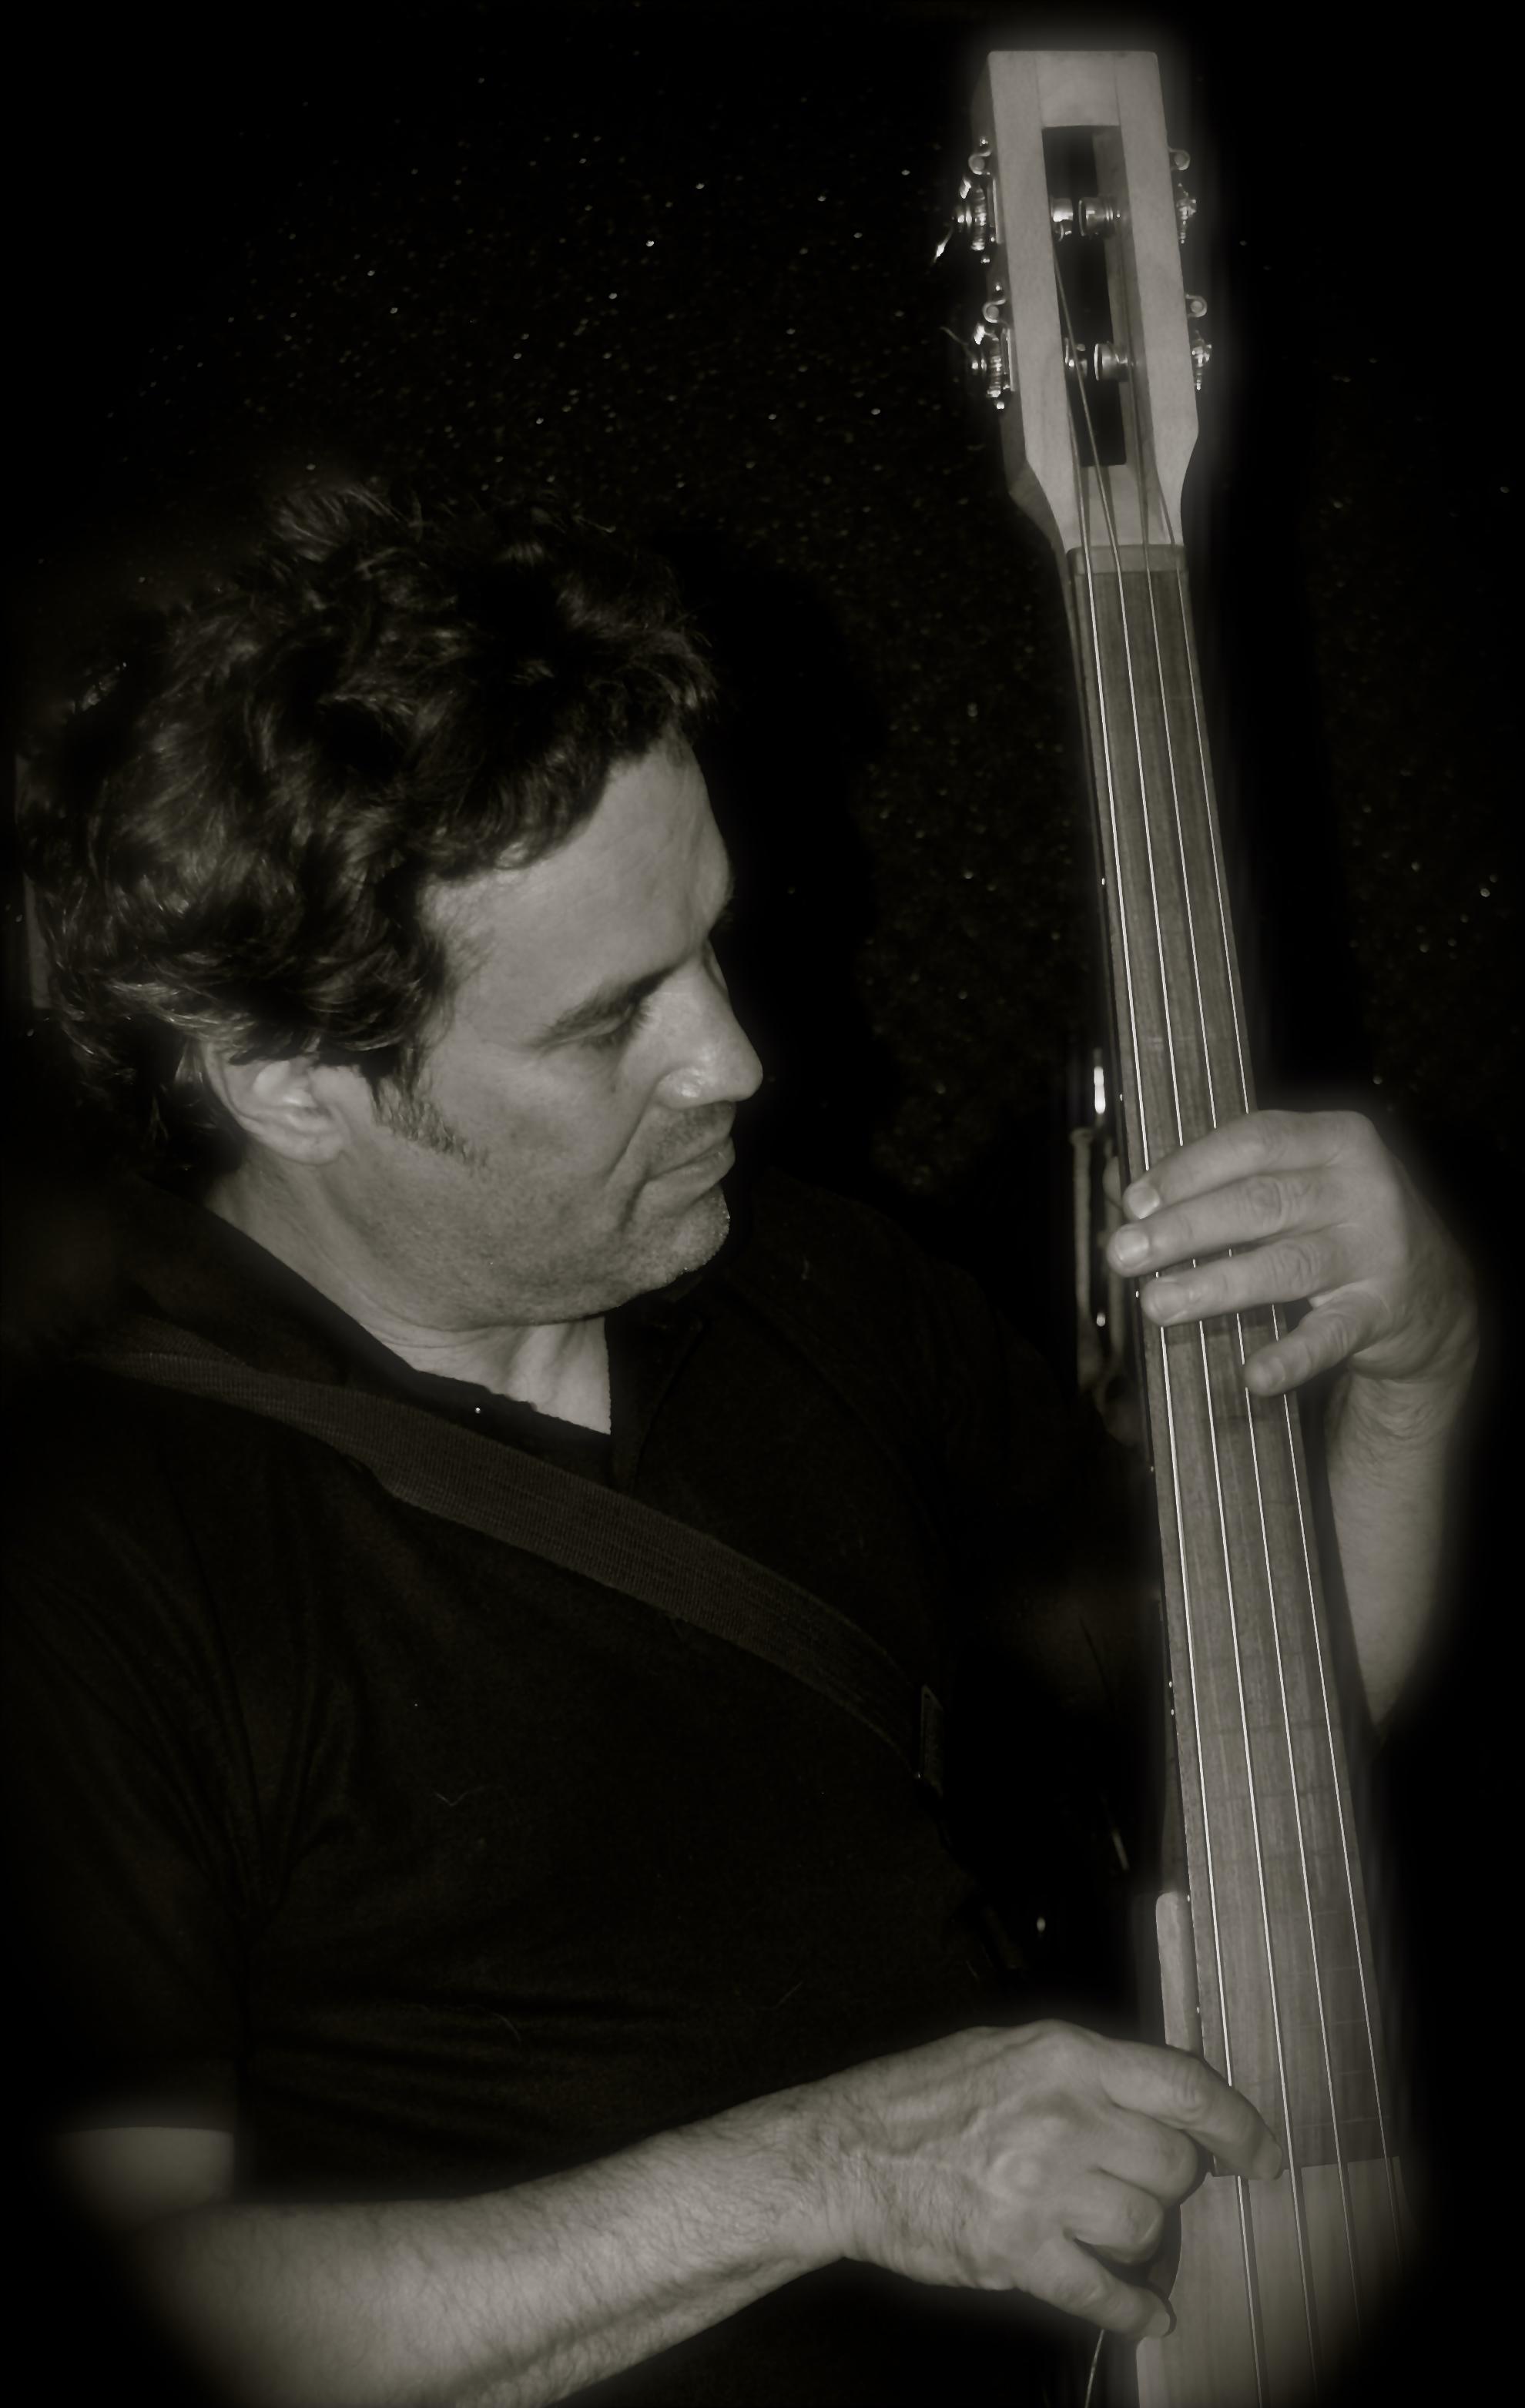 Mike Bischof